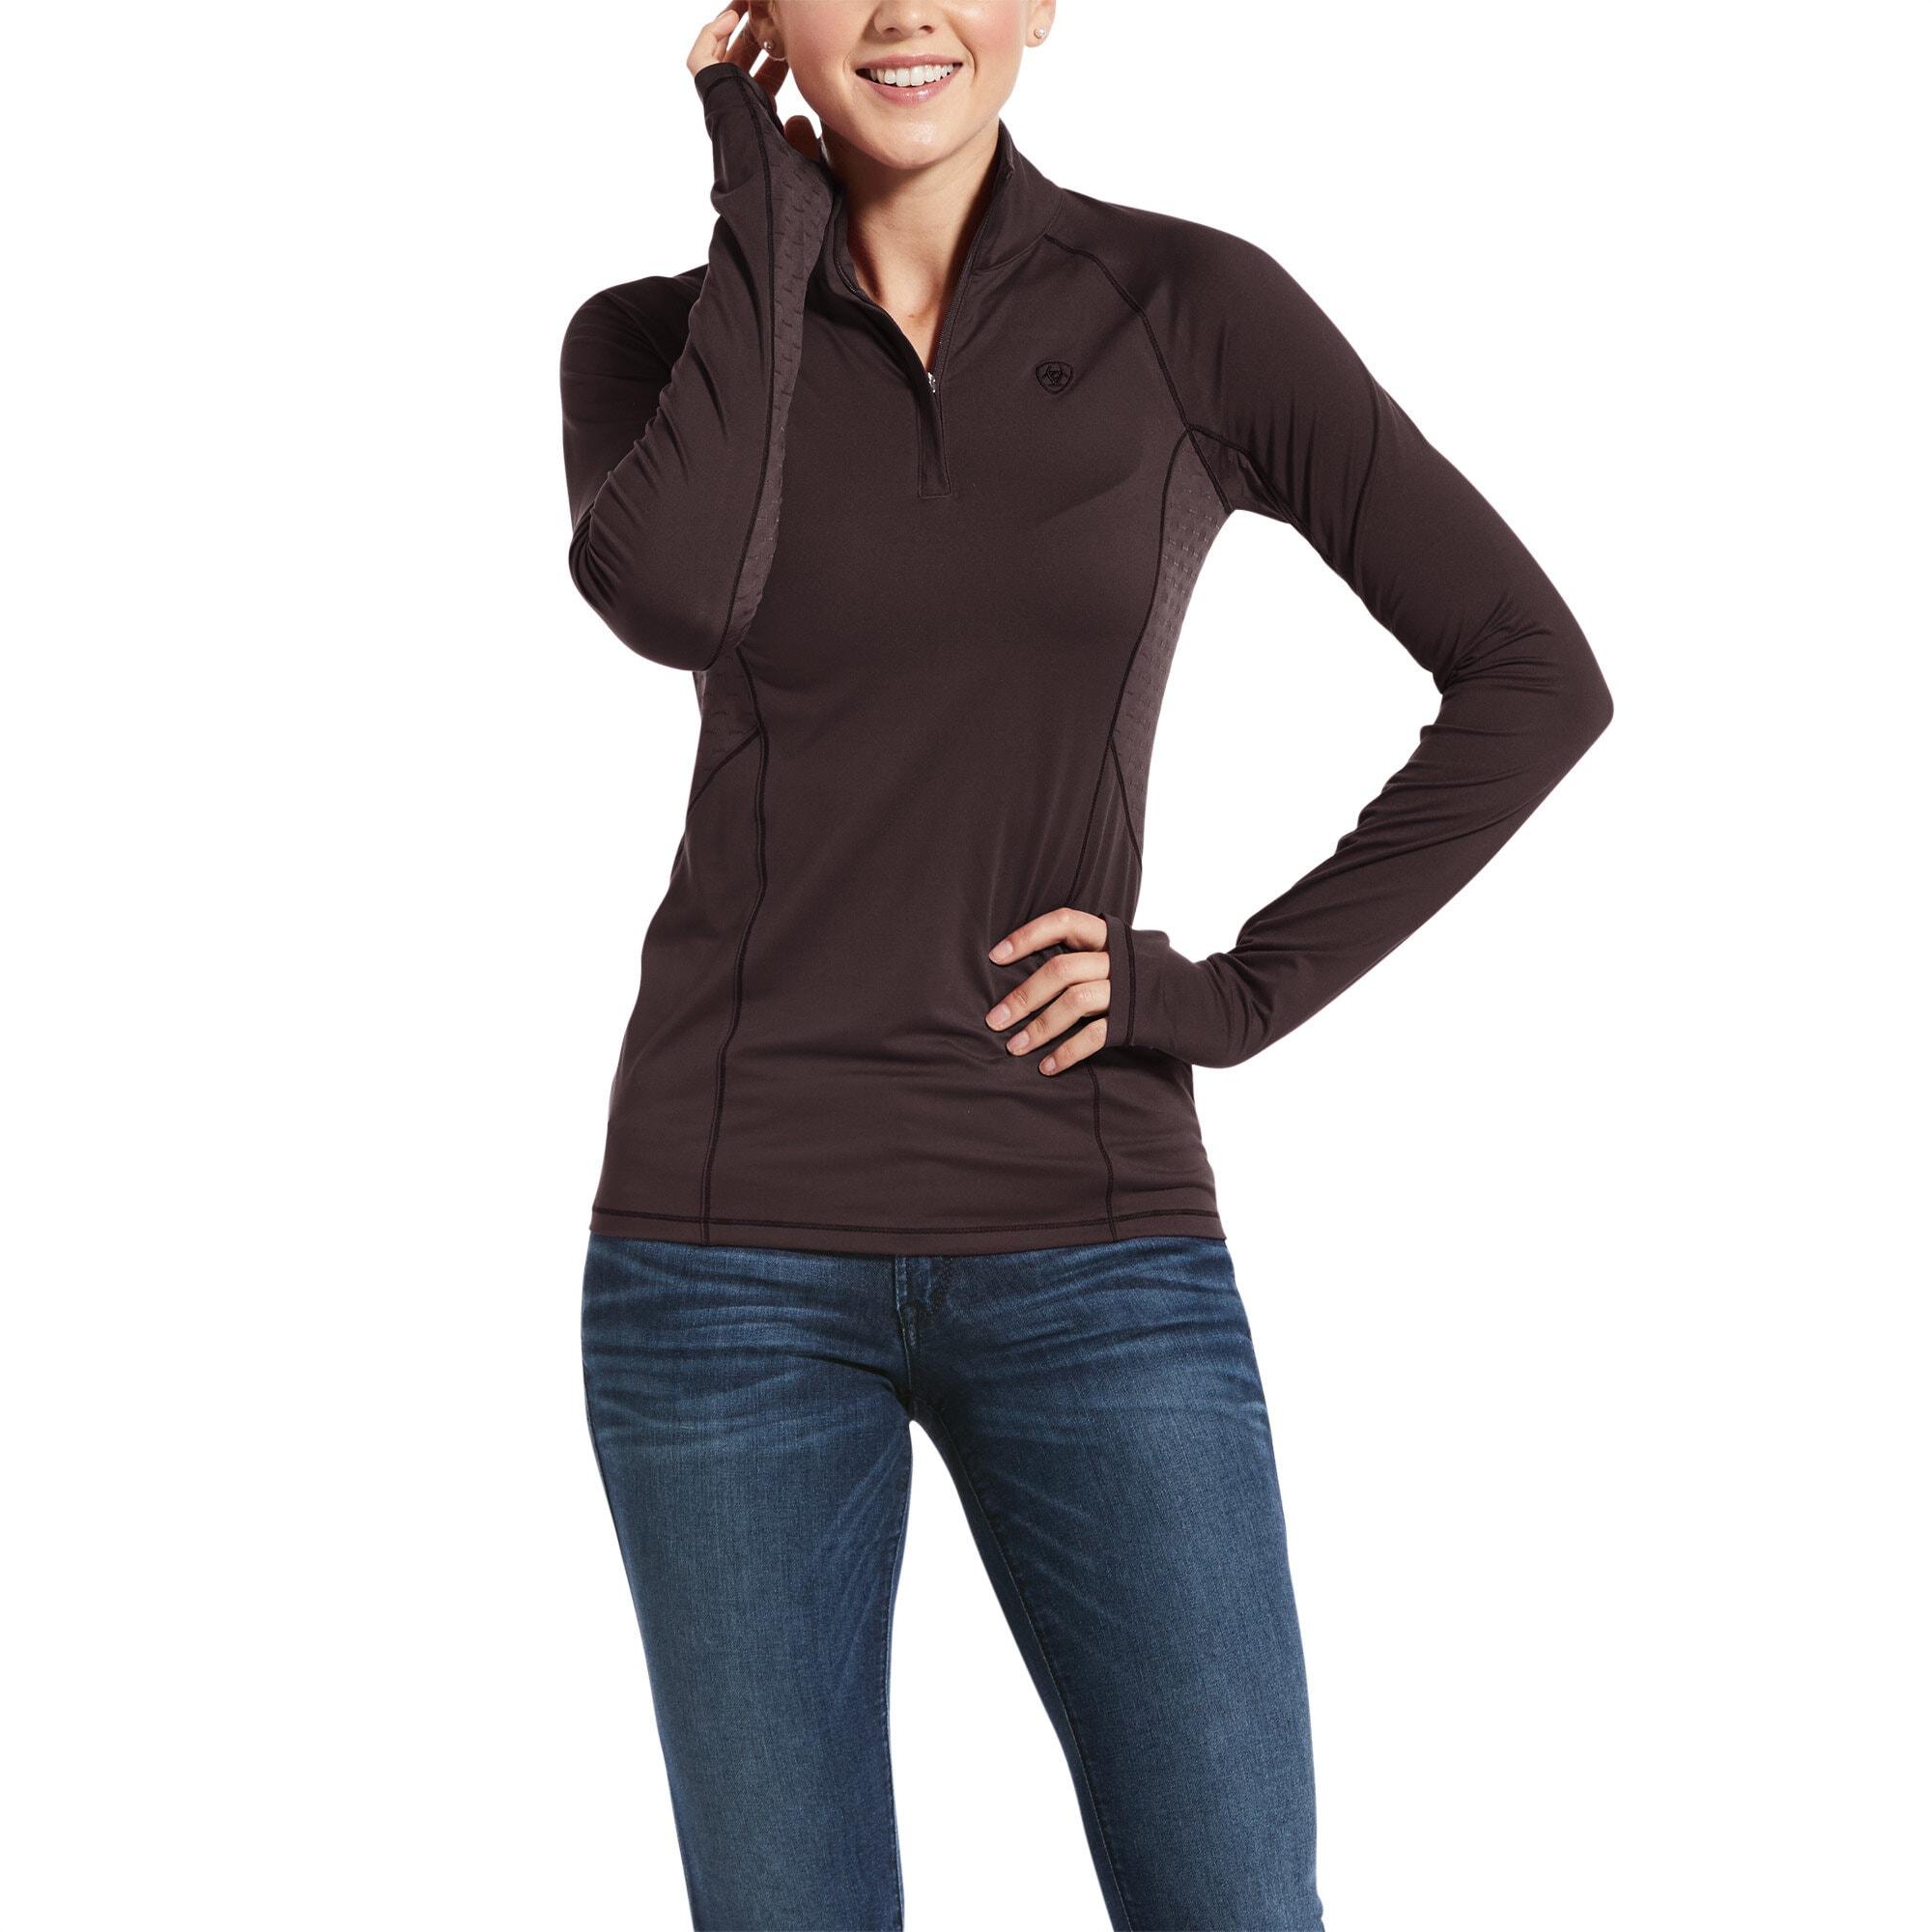 Sweater Lowell - Chocovine